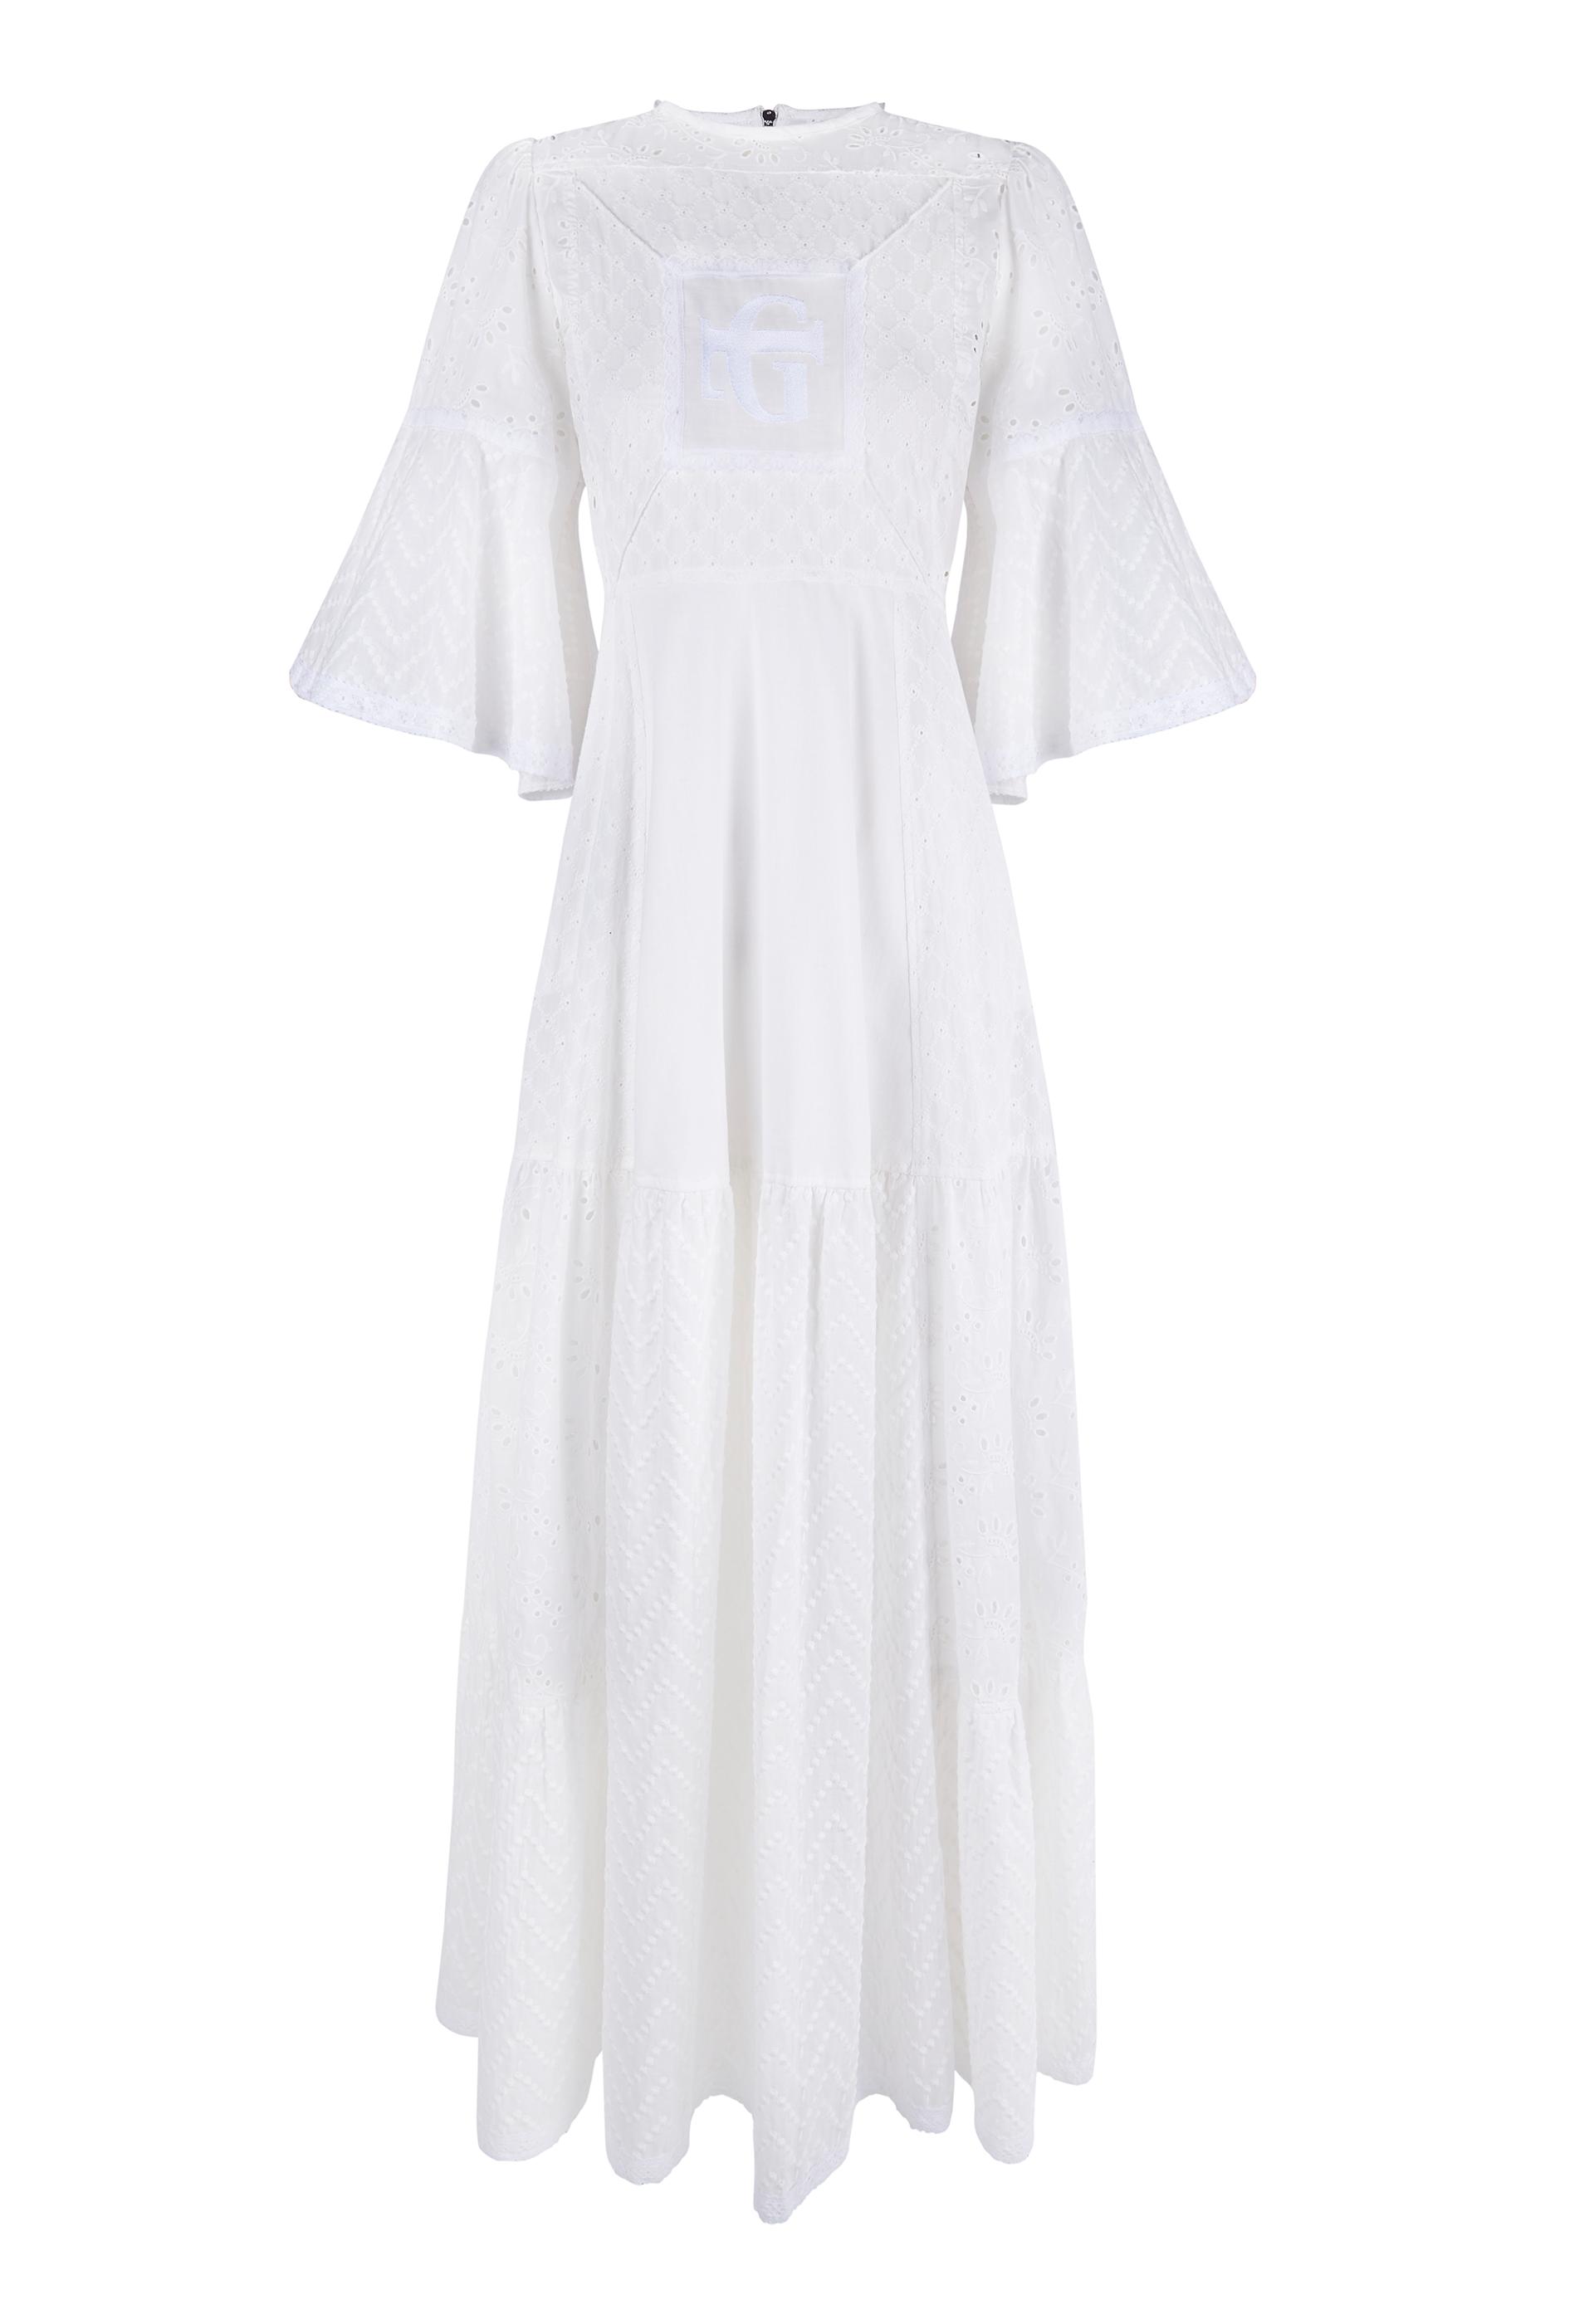 Vestido Guts and Love Blanco